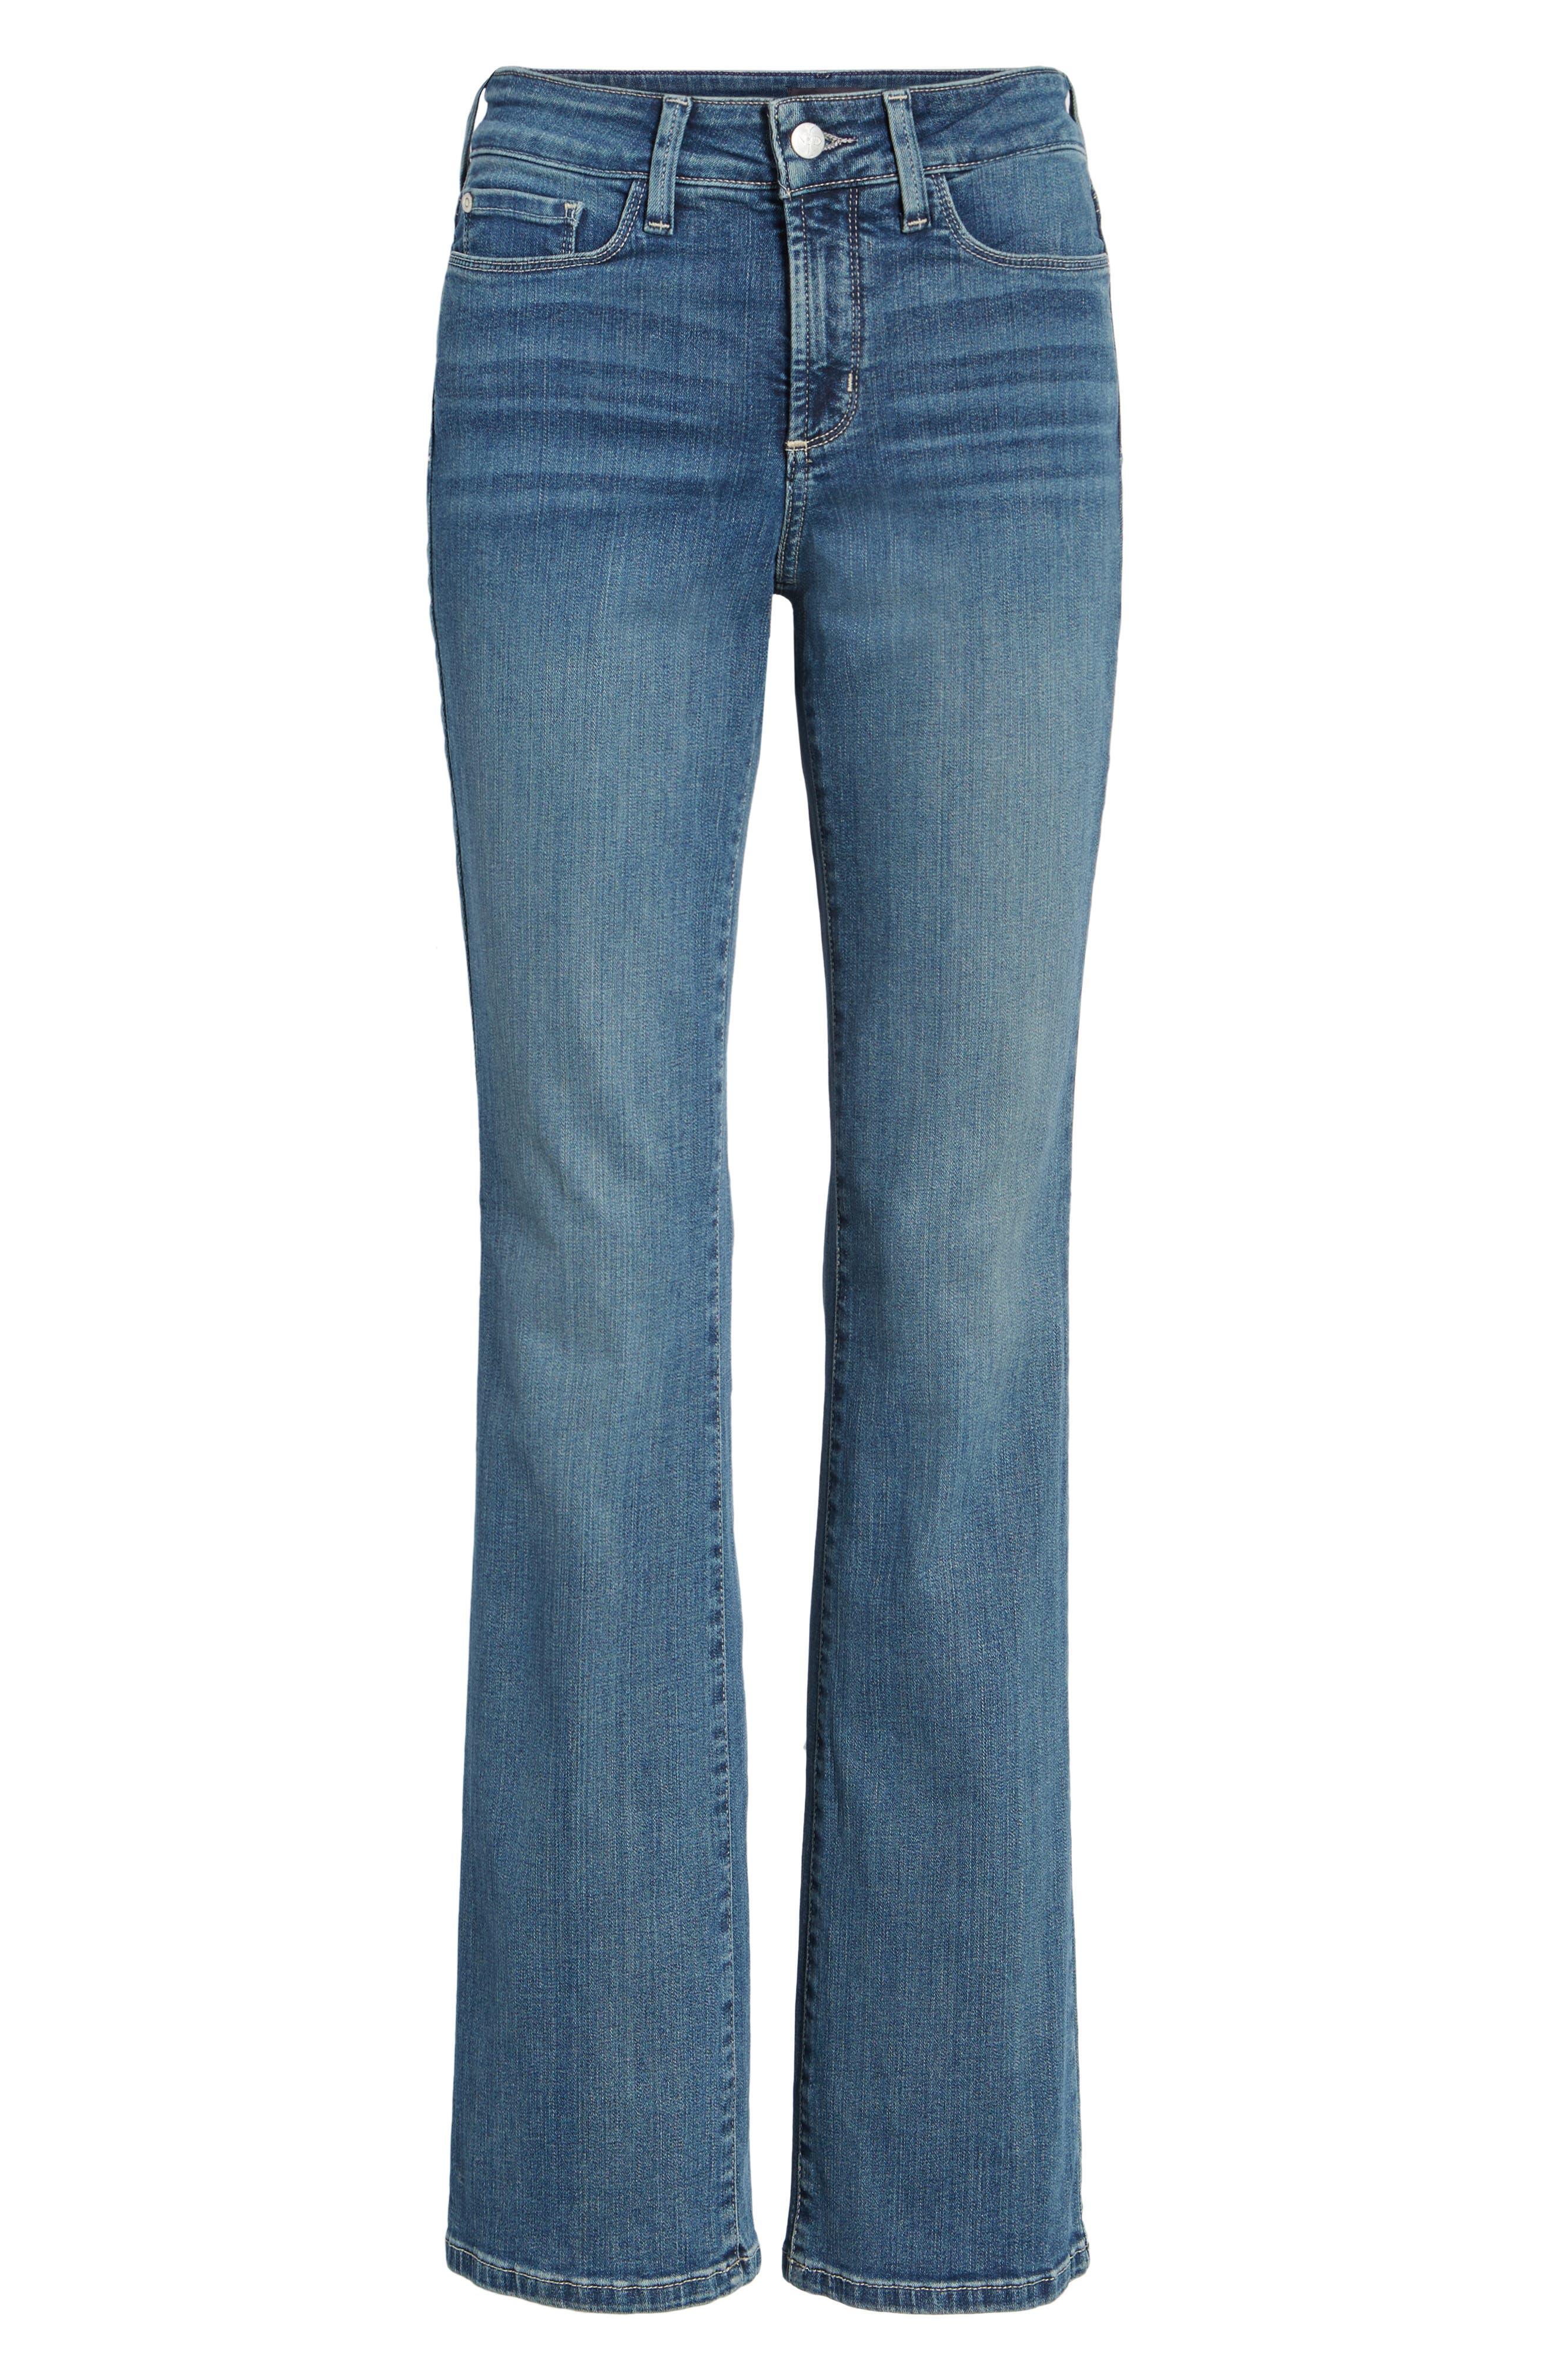 NYDJ, Barbara Stretch Bootcut Jeans, Alternate thumbnail 5, color, HEYBURN